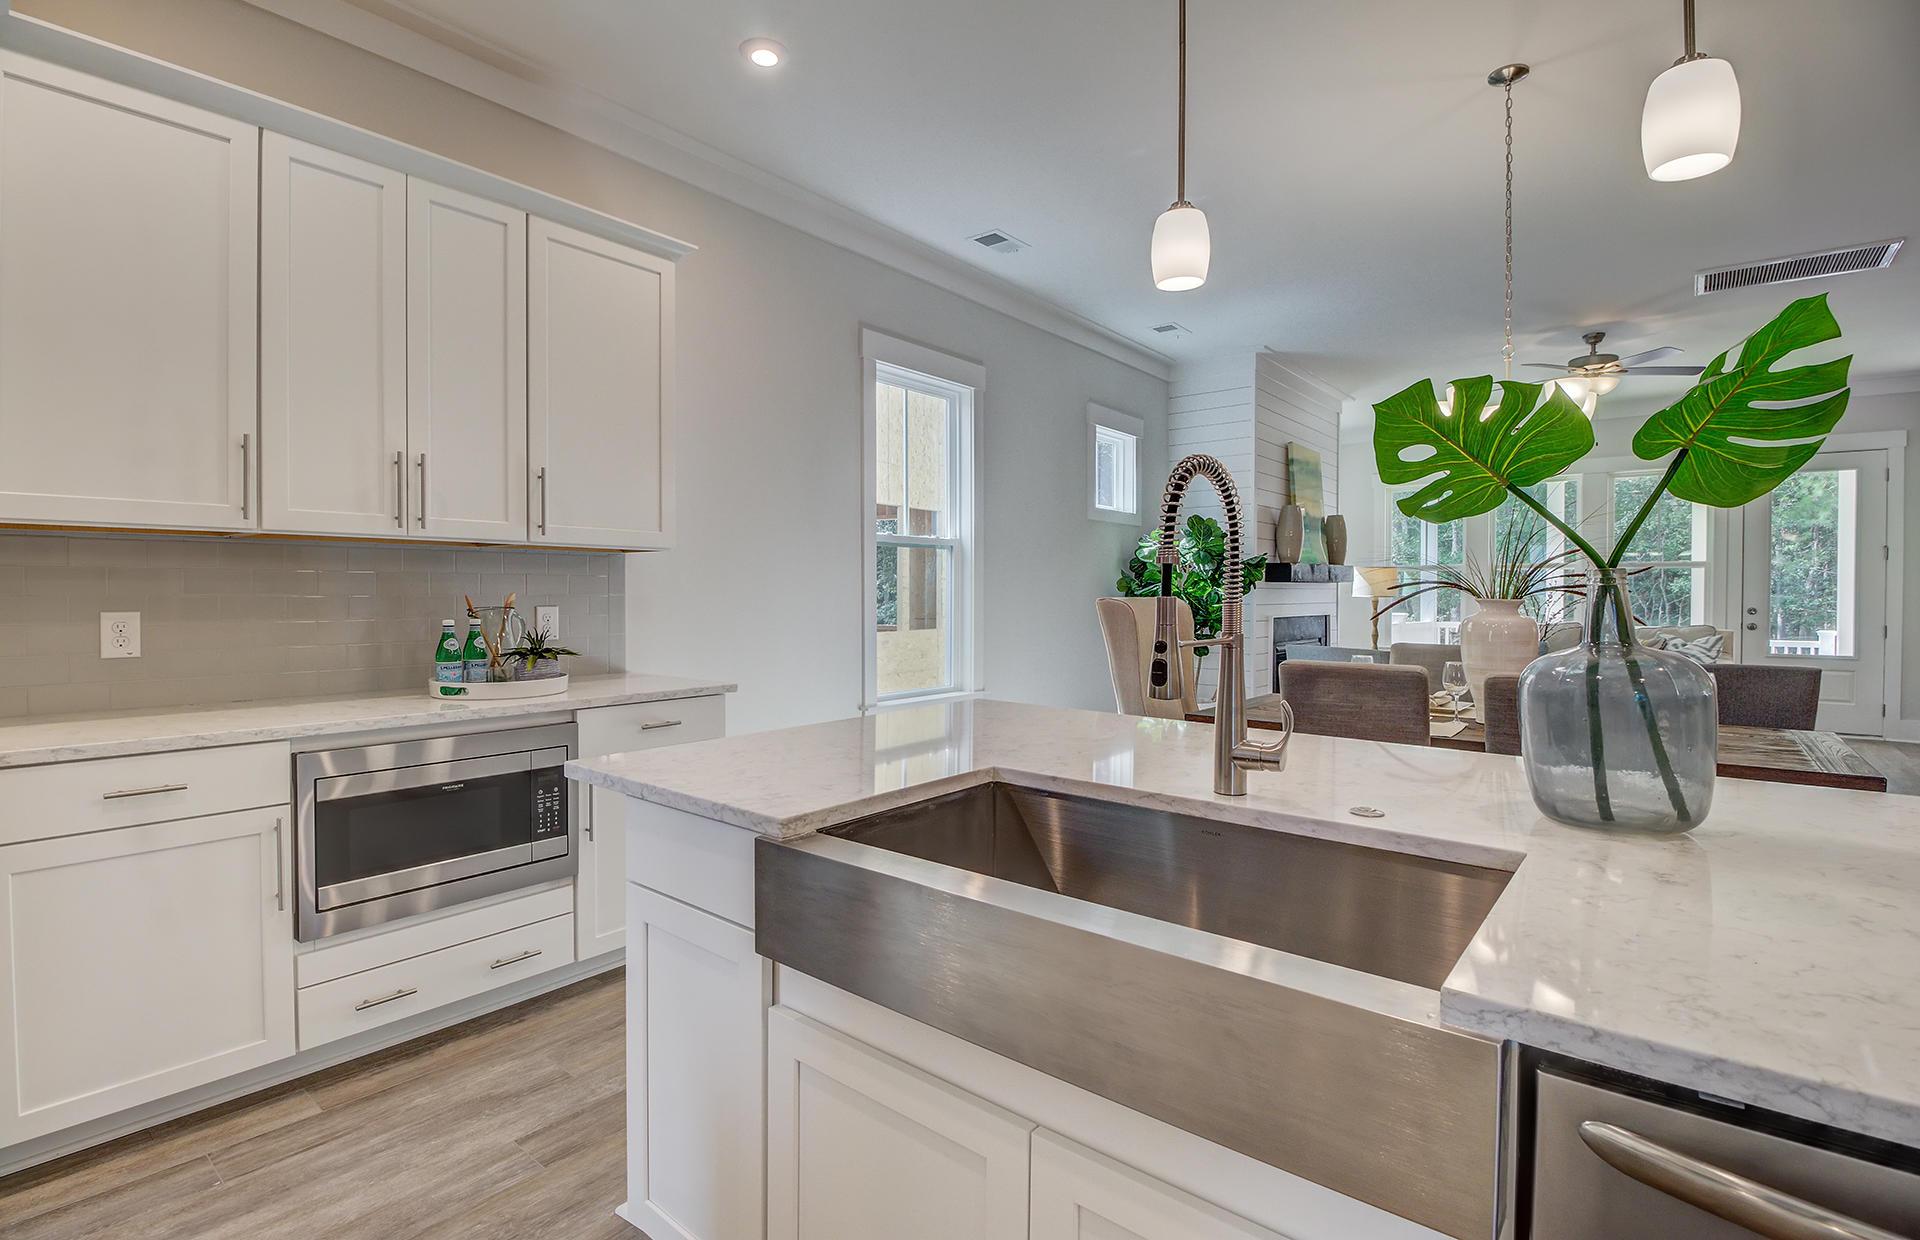 Fulton Park Homes For Sale - 1282 Max, Mount Pleasant, SC - 21